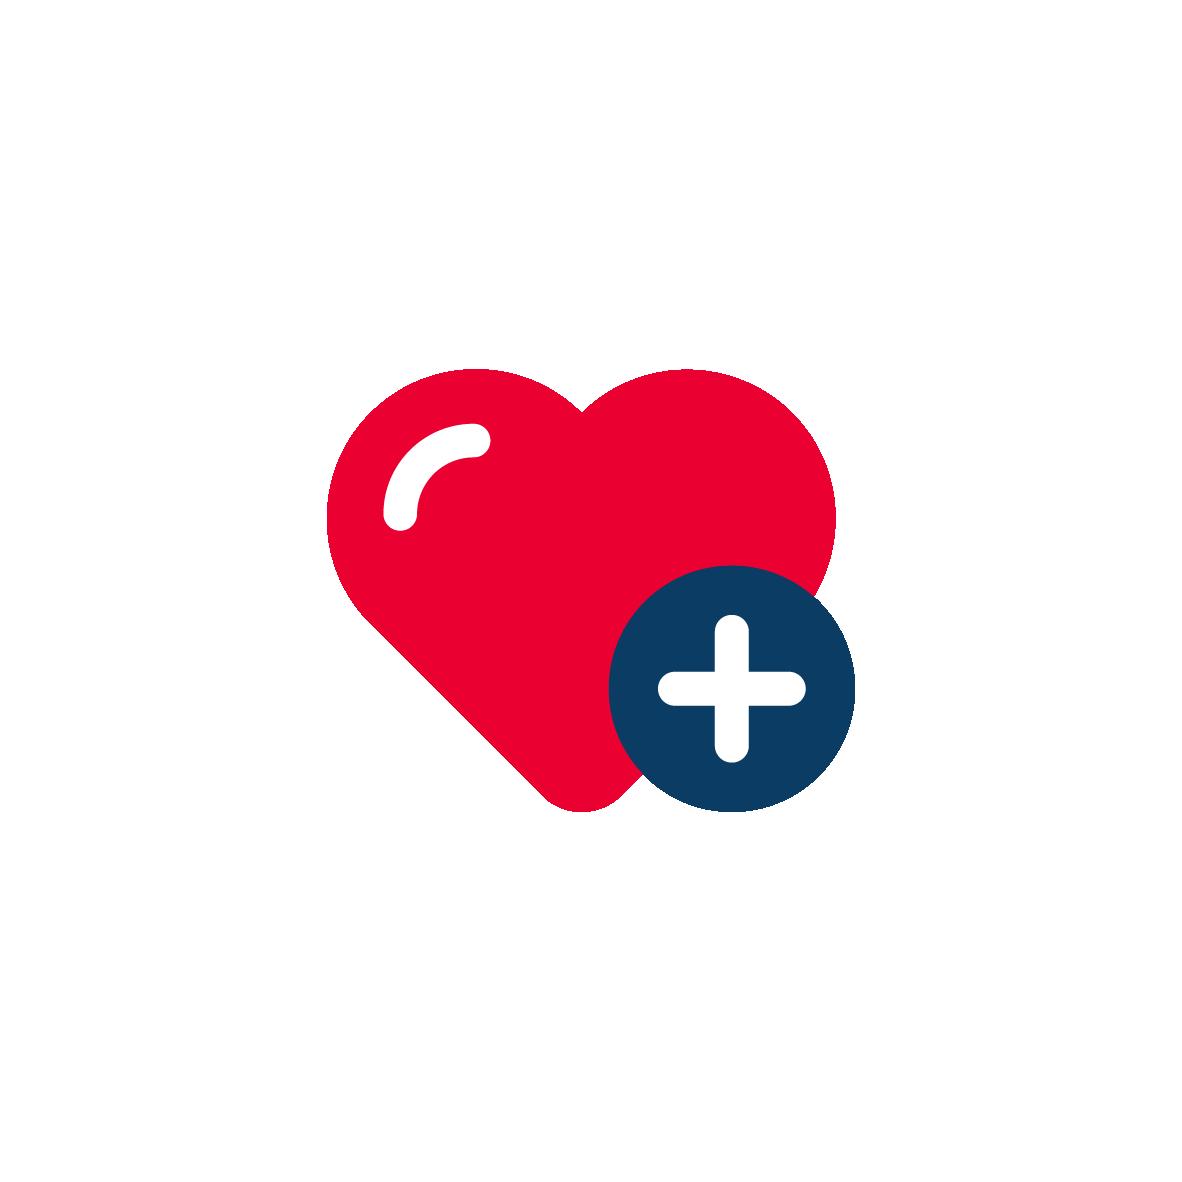 Heart pictogram